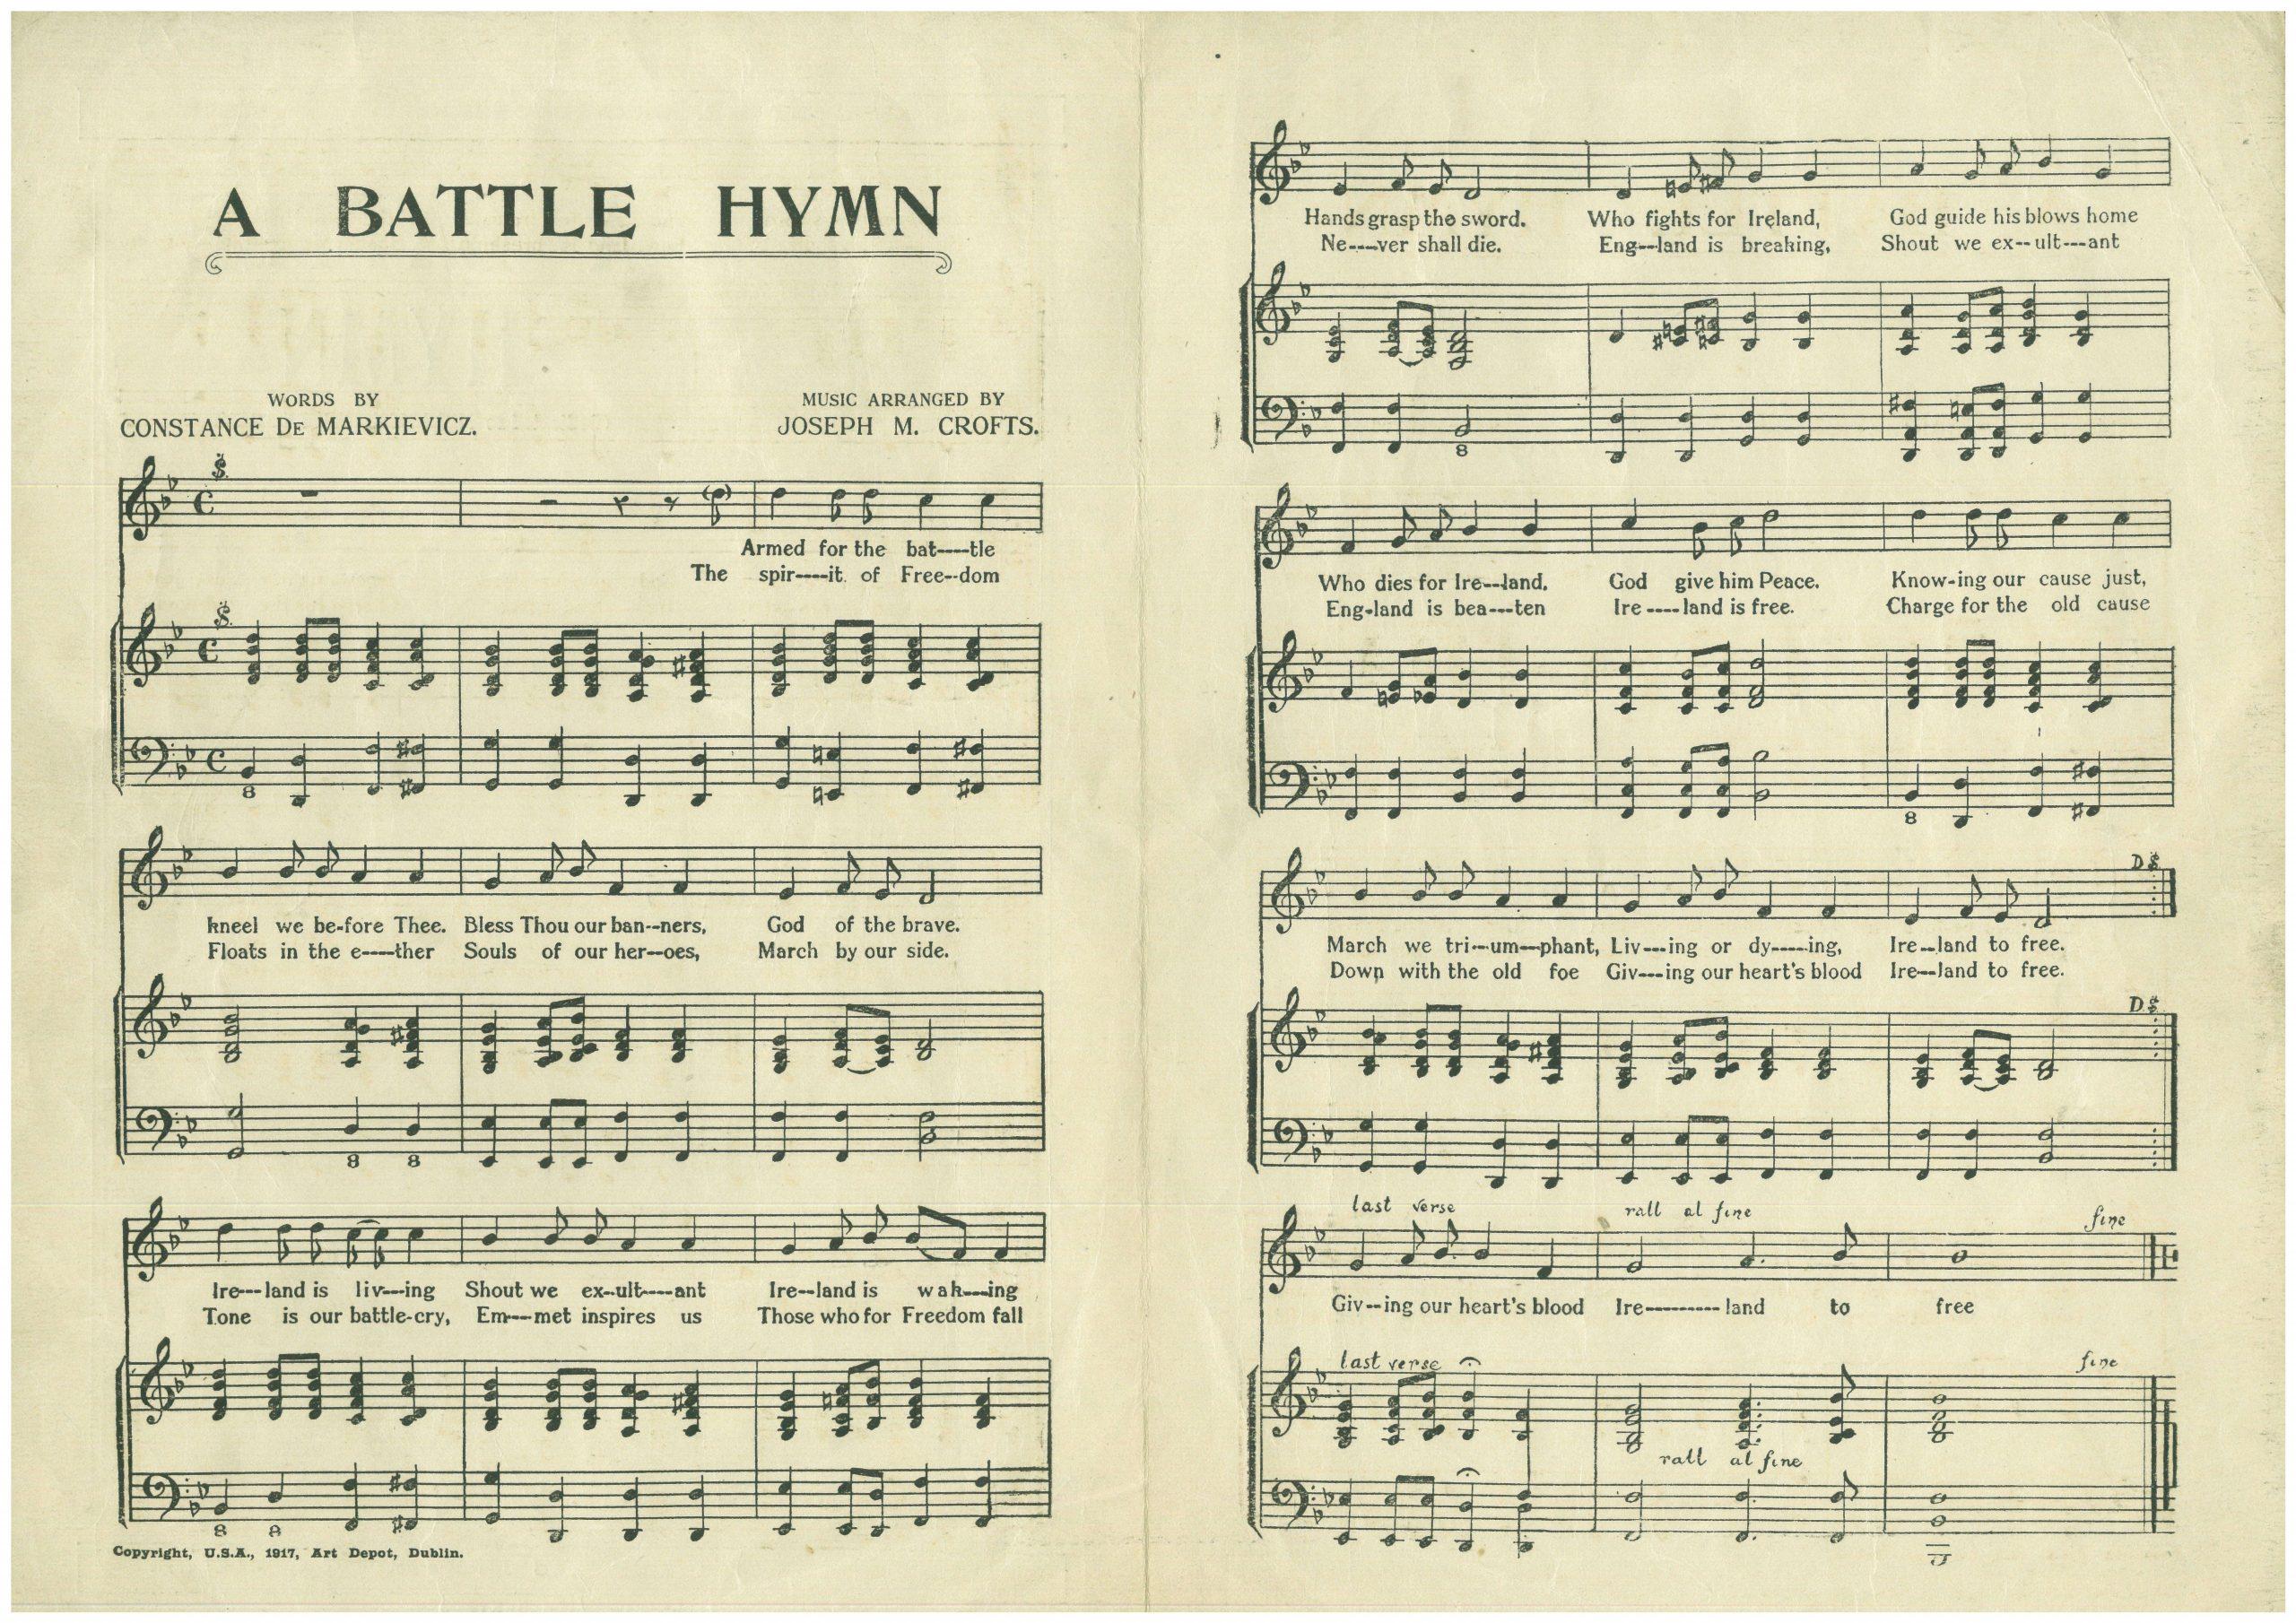 A Battle Hymn